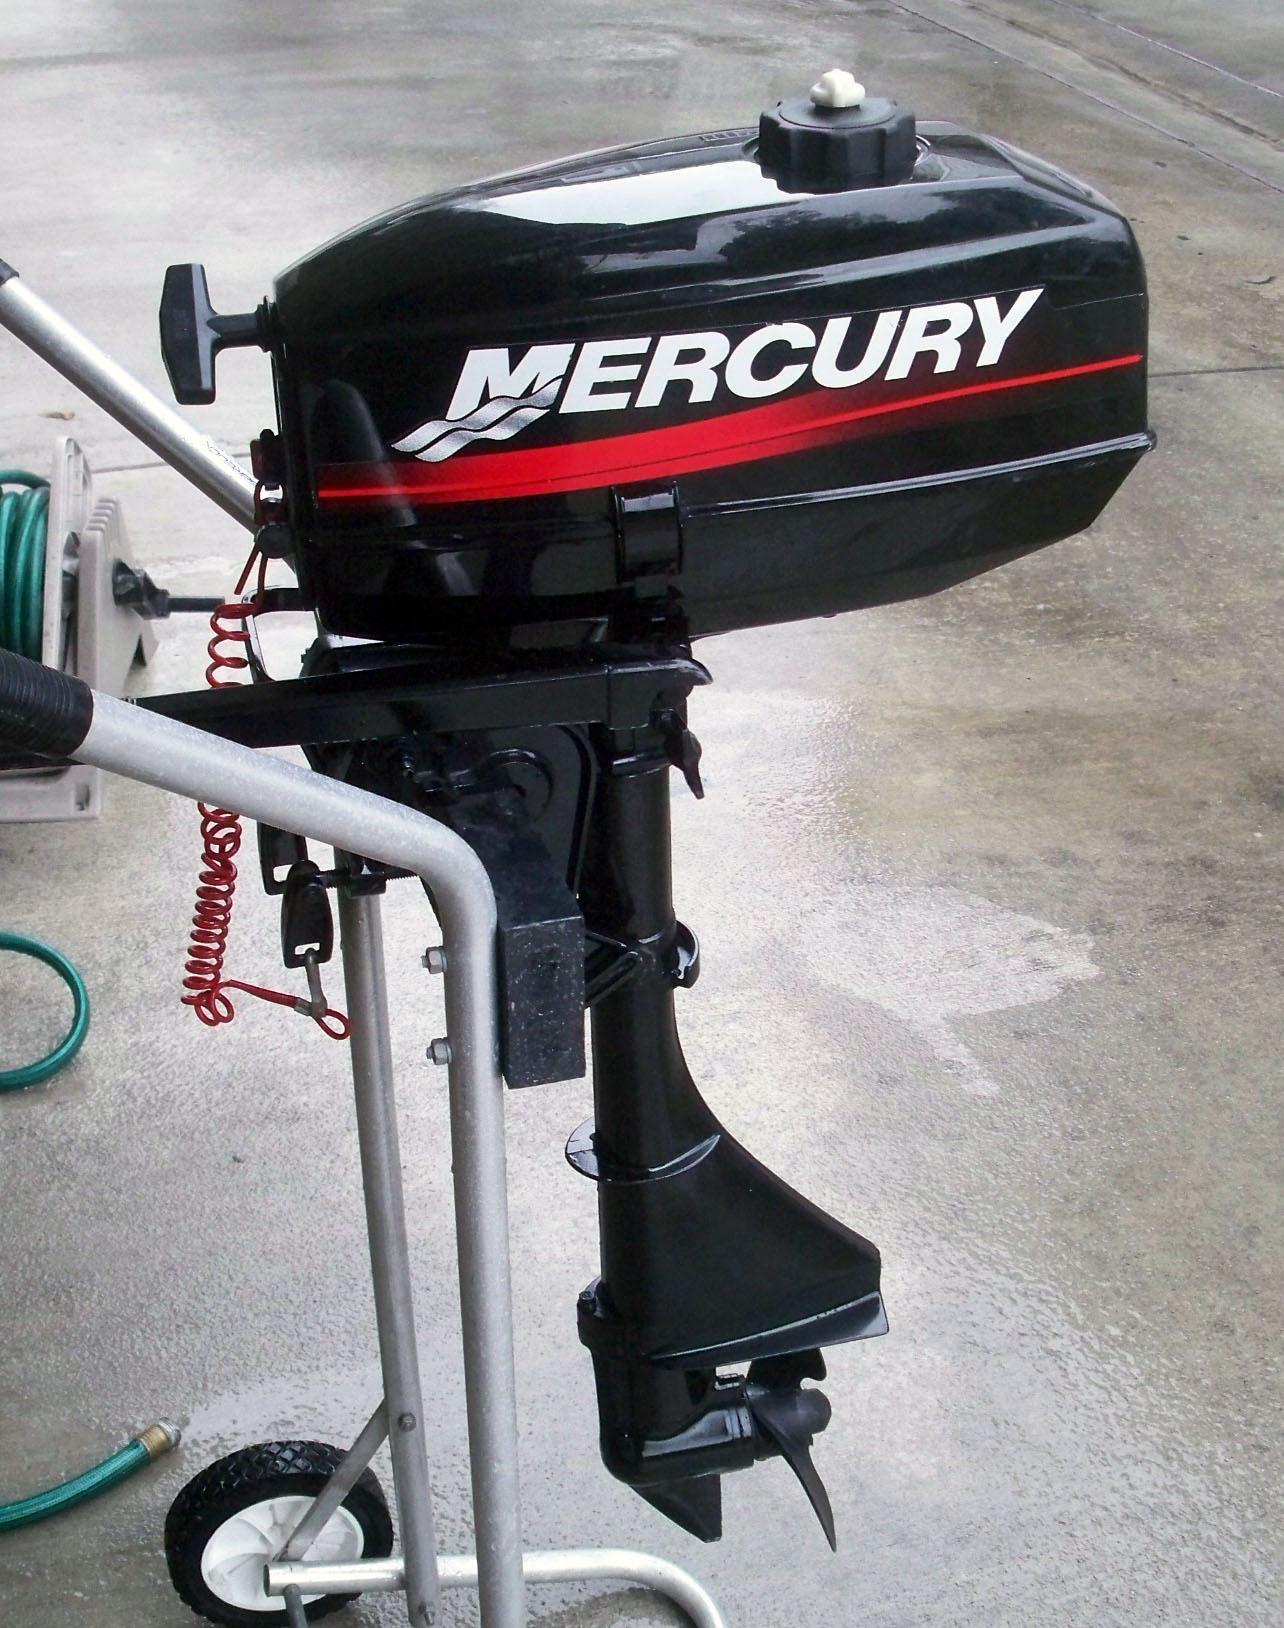 http://mlodka.ru/assets/images/photo/MERCURY/2x/2.5/mercury_me_2%20(1).JPG